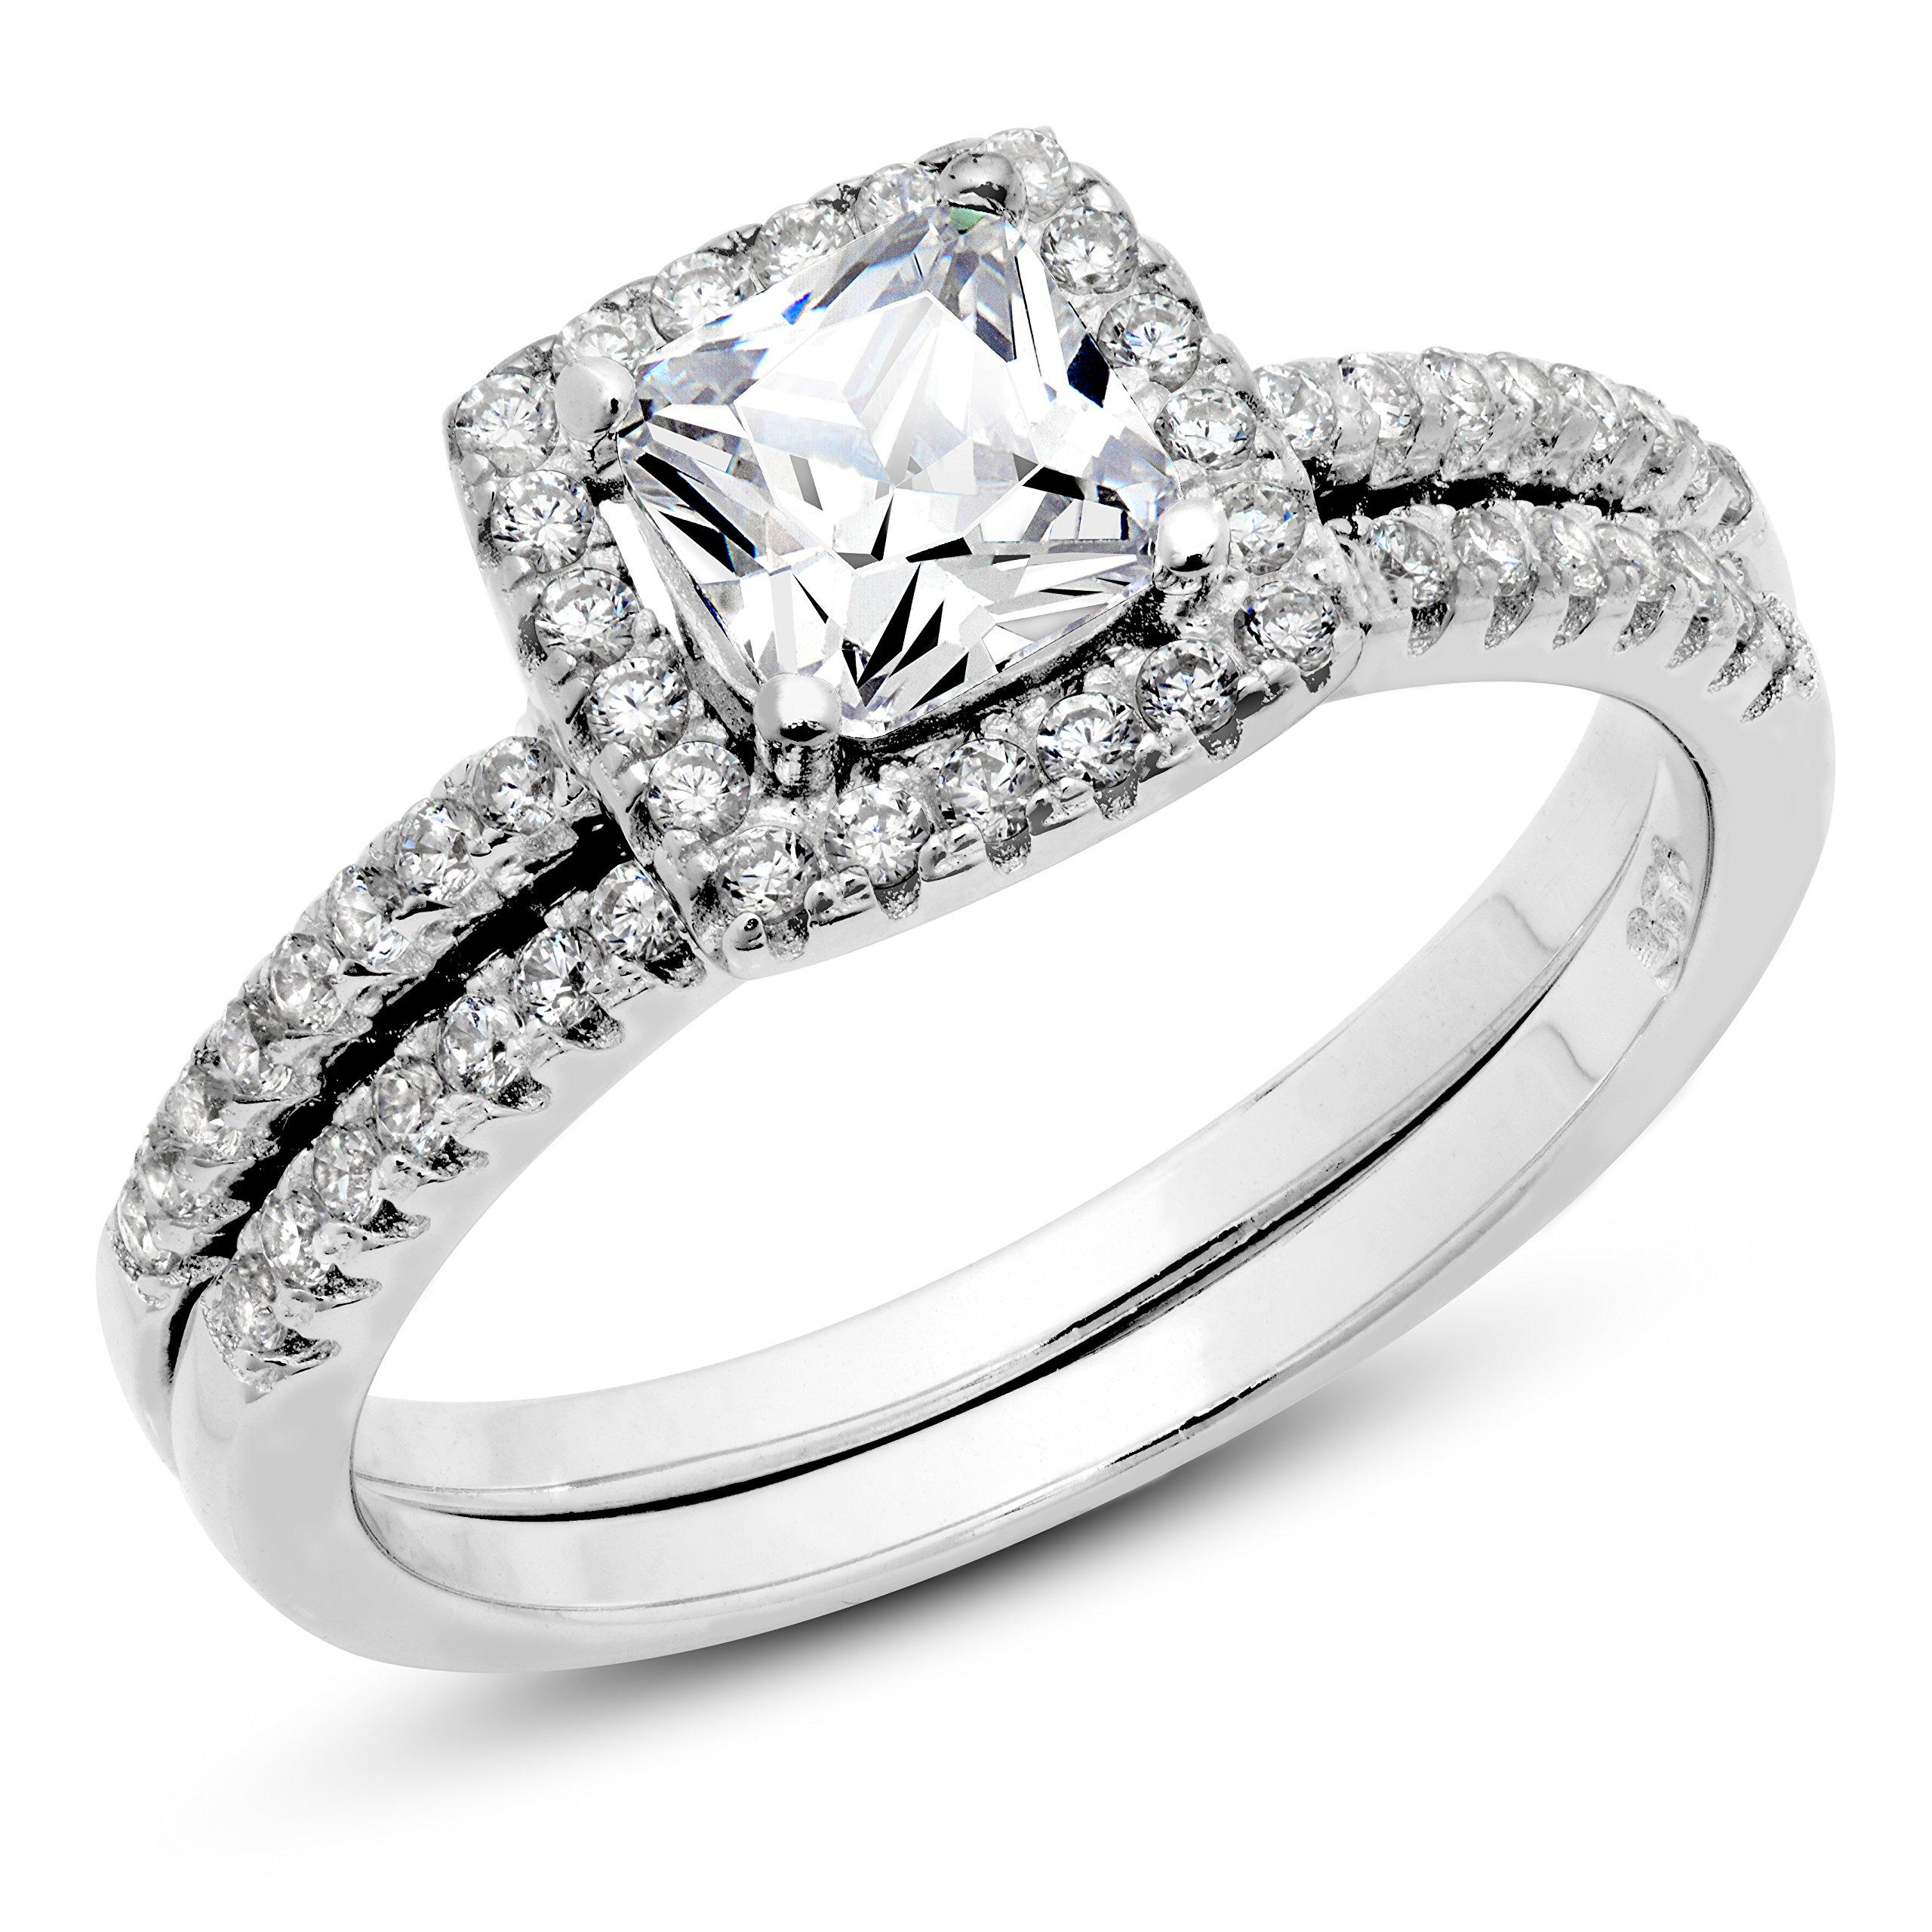 925 Sterling Silver Cushion Cubic Zirconia CZ 2Pc Halo Wedding Engagement Ring Set Sz 10